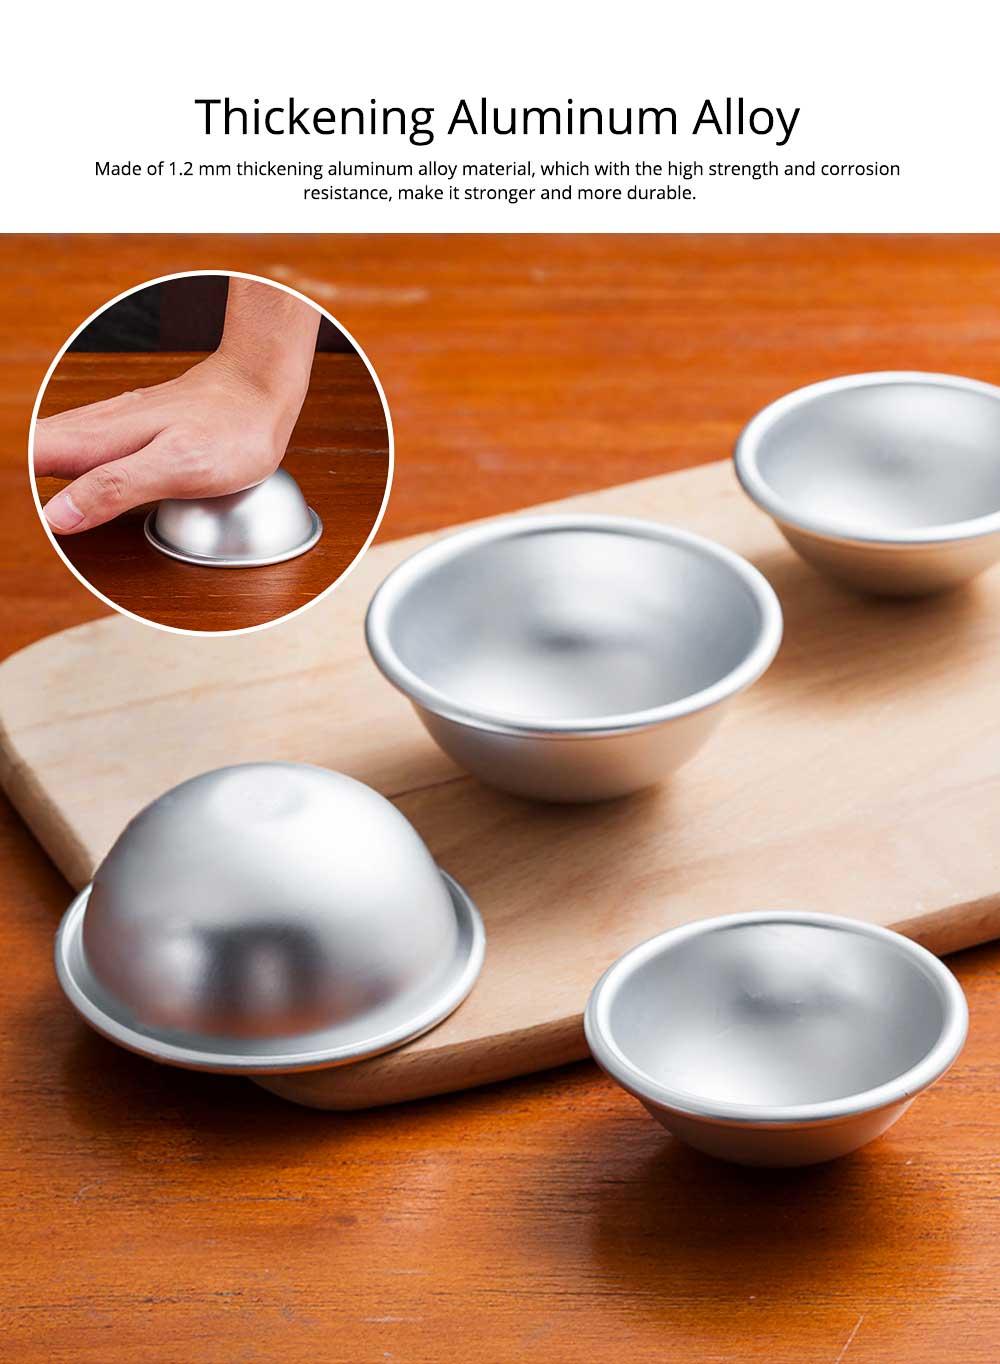 Semi Circle Pastry Mold, Aluminum Alloy DIY Bath Salt Bomb Molds 1